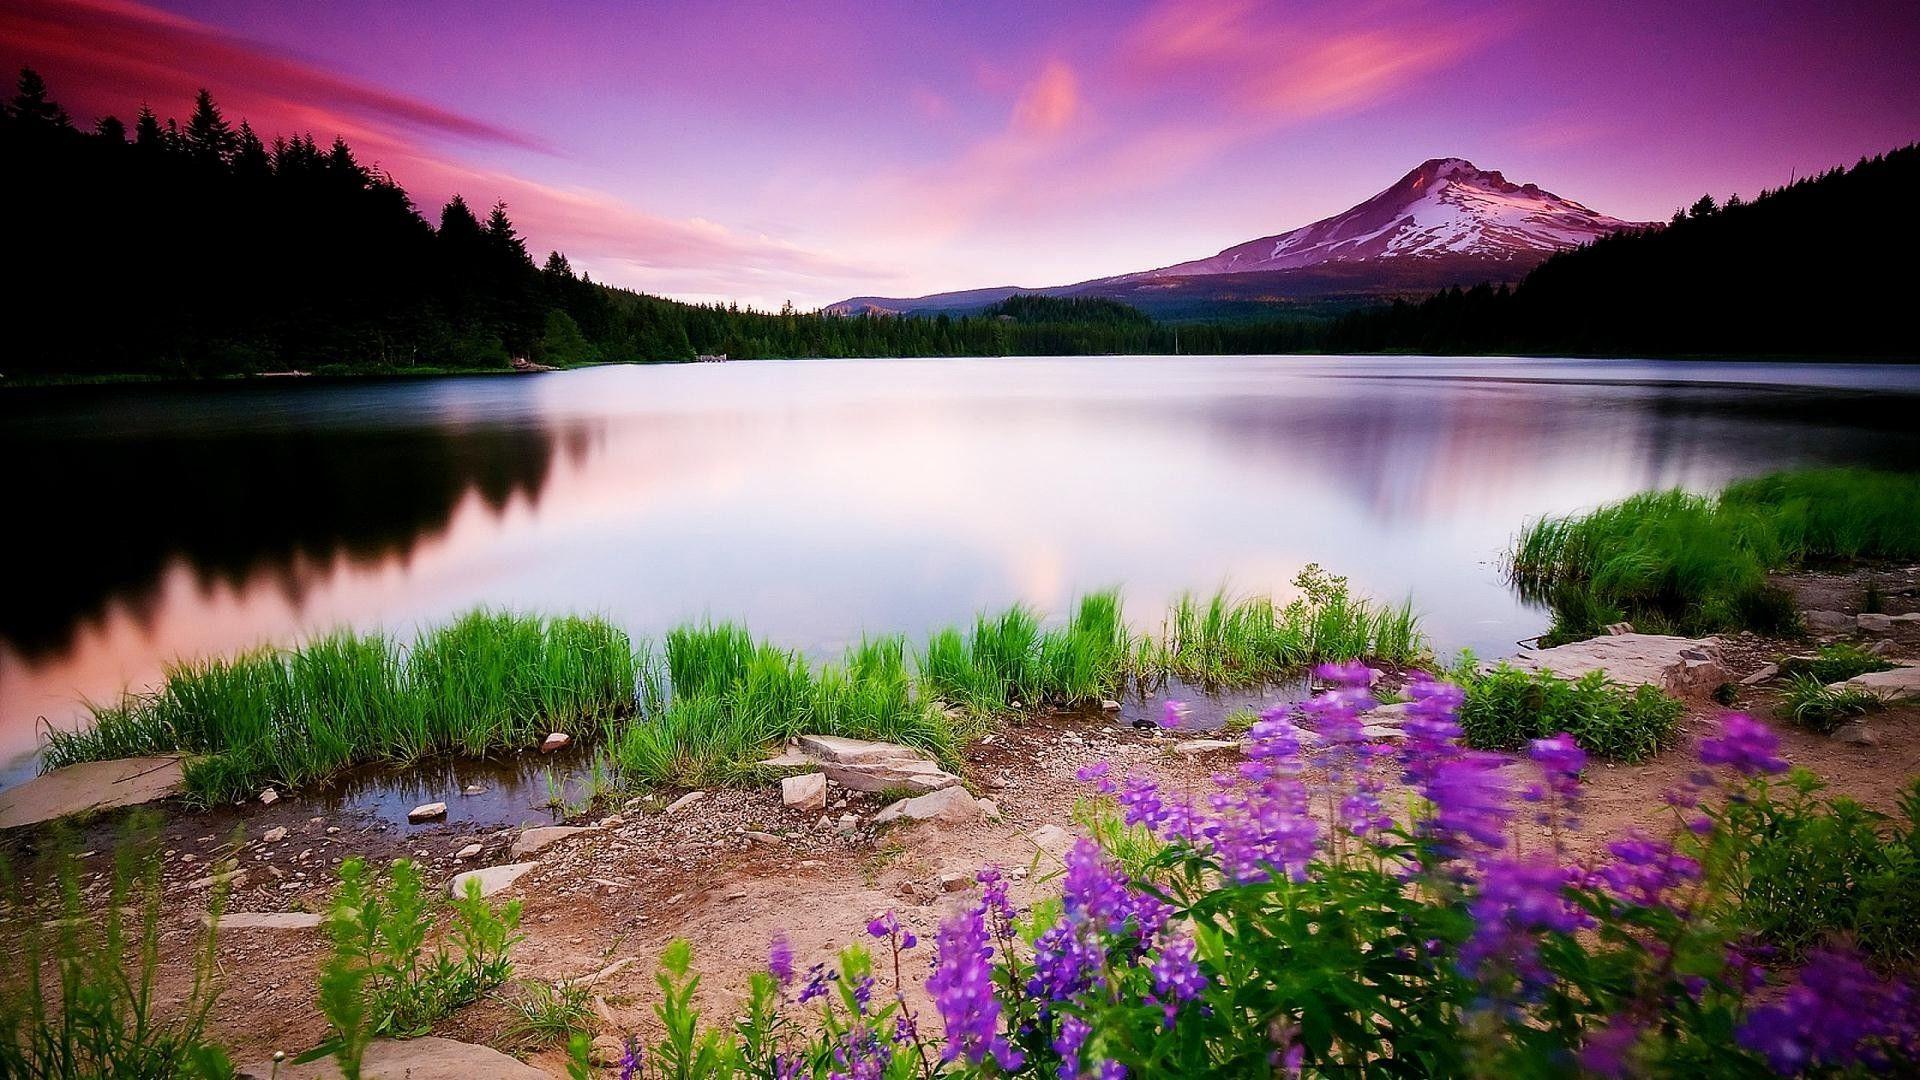 Nature Photo Hd 1080p background